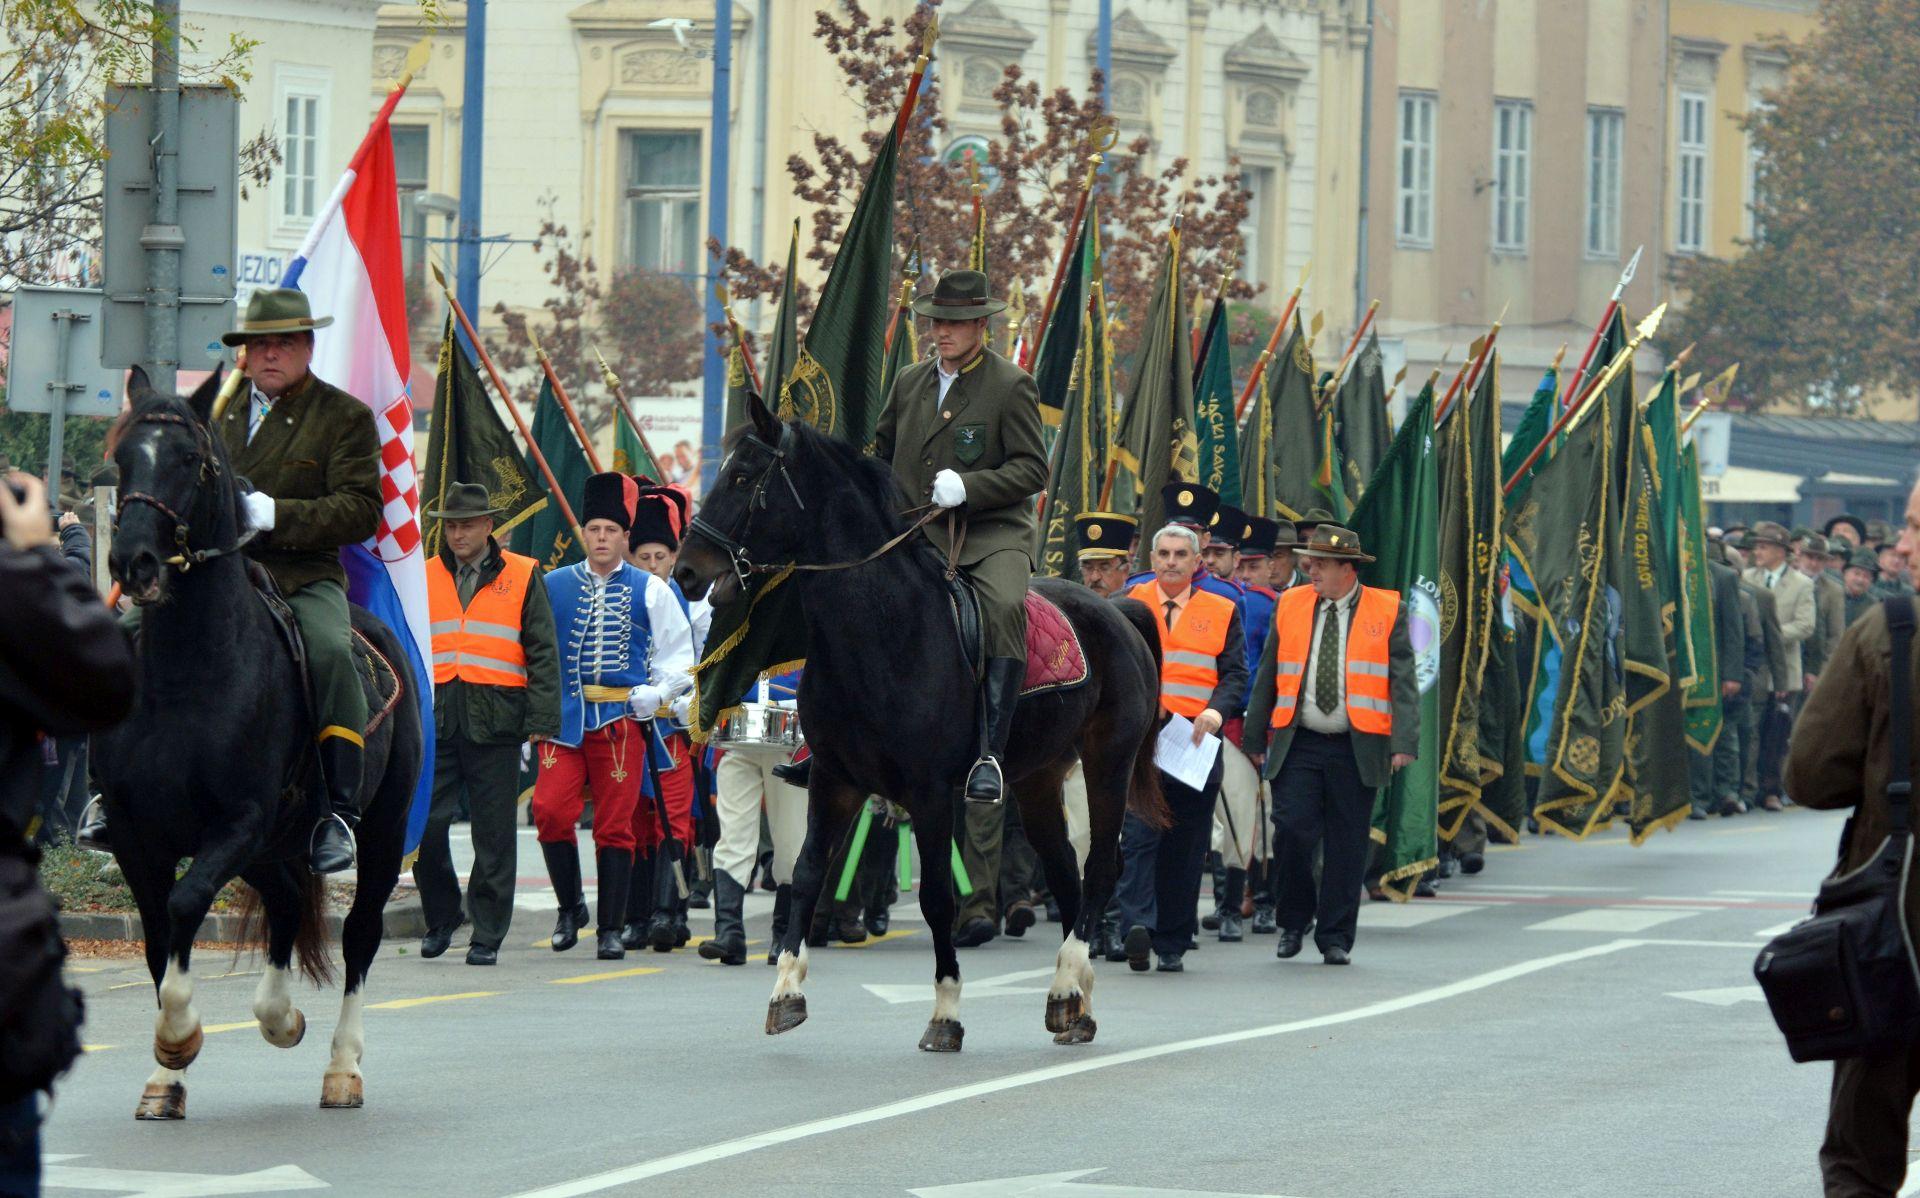 SVEČANOST U KARLOVCU: 1.200 lovaca slavi spomendan sv. Huberta